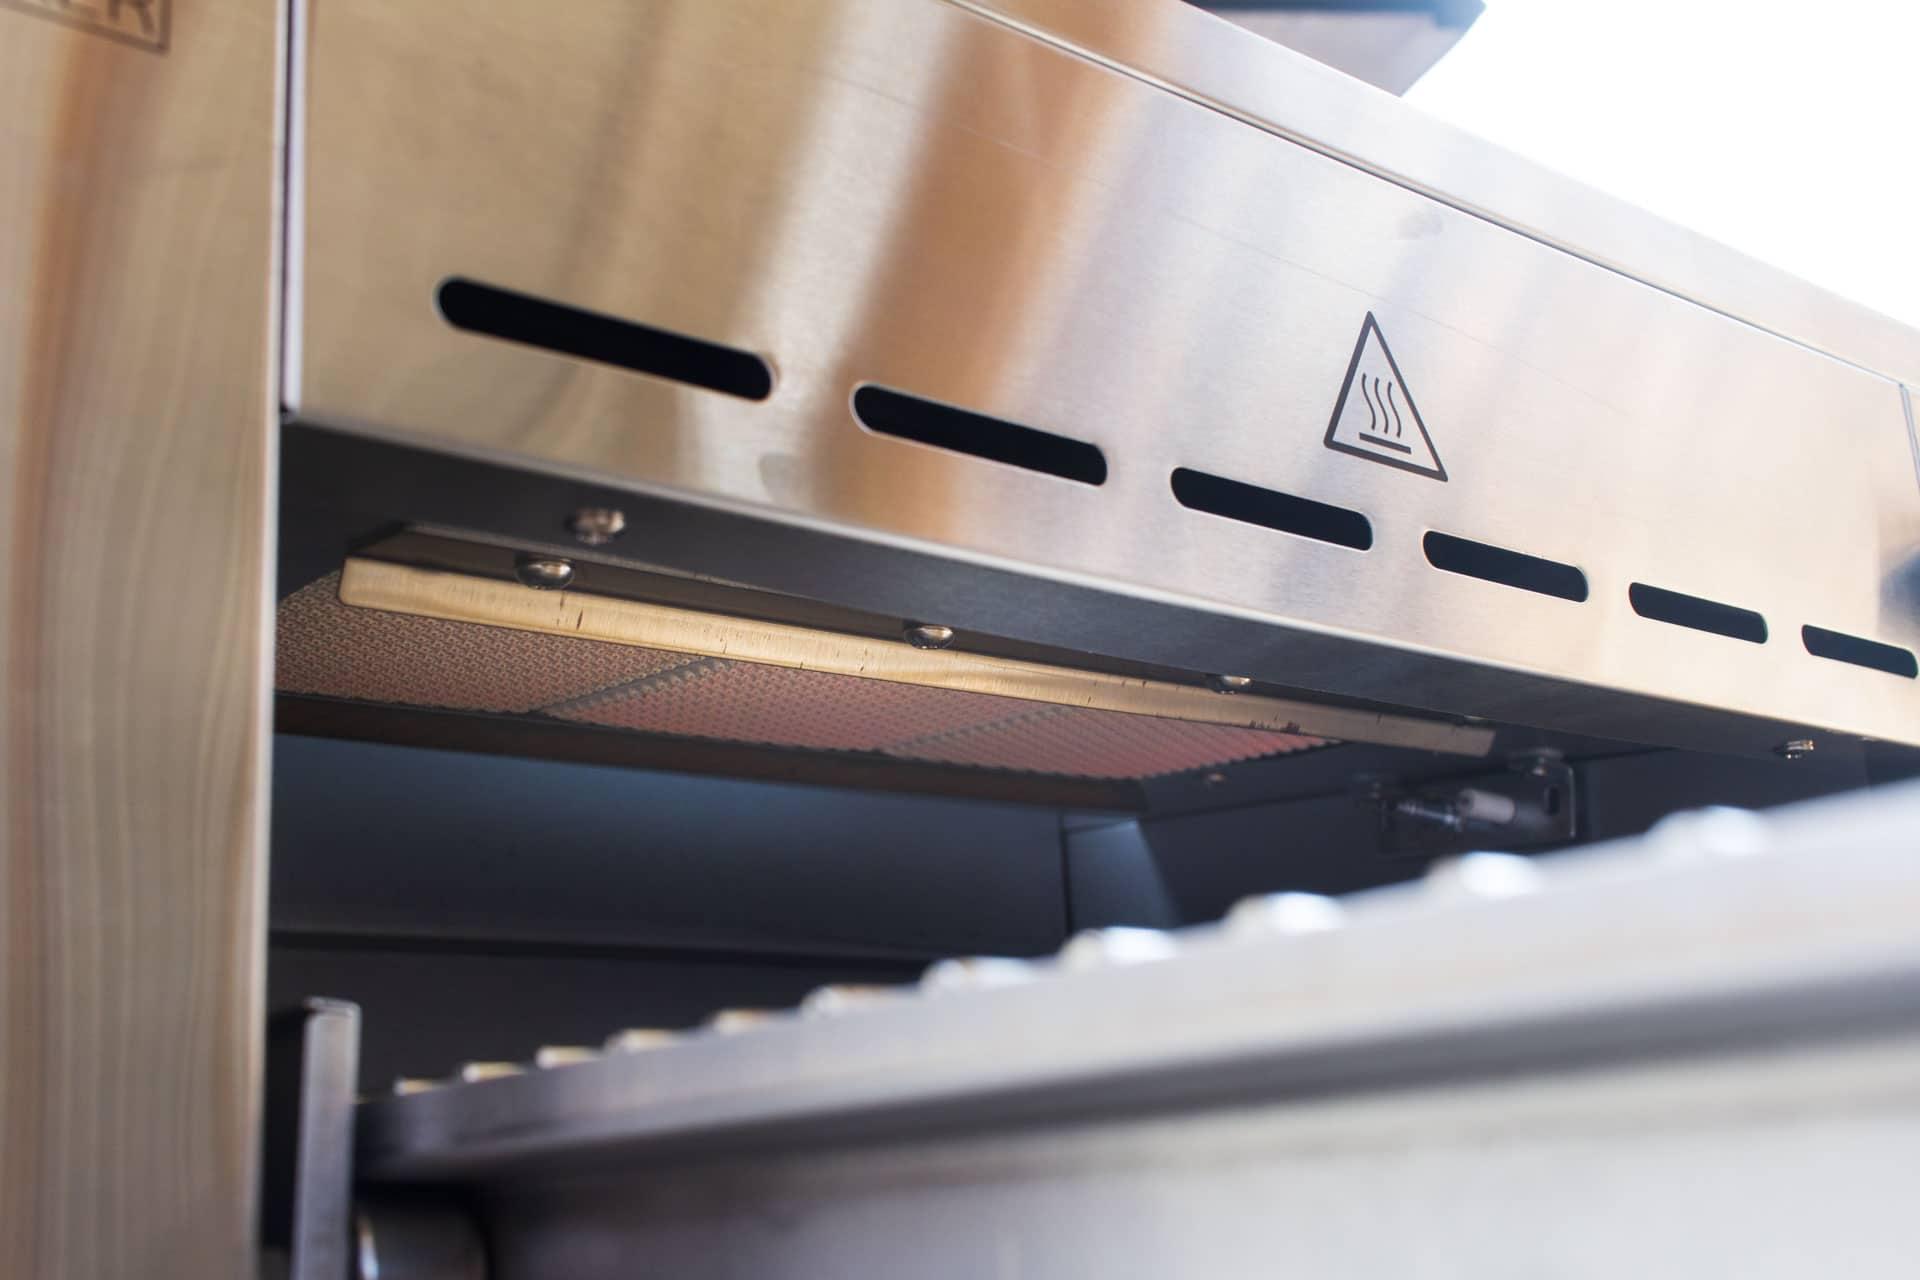 Aldi Gasgrill Verfügbarkeit : Gasgrill u maximaler grillspaß bei minimalem aufwand mediamarkt